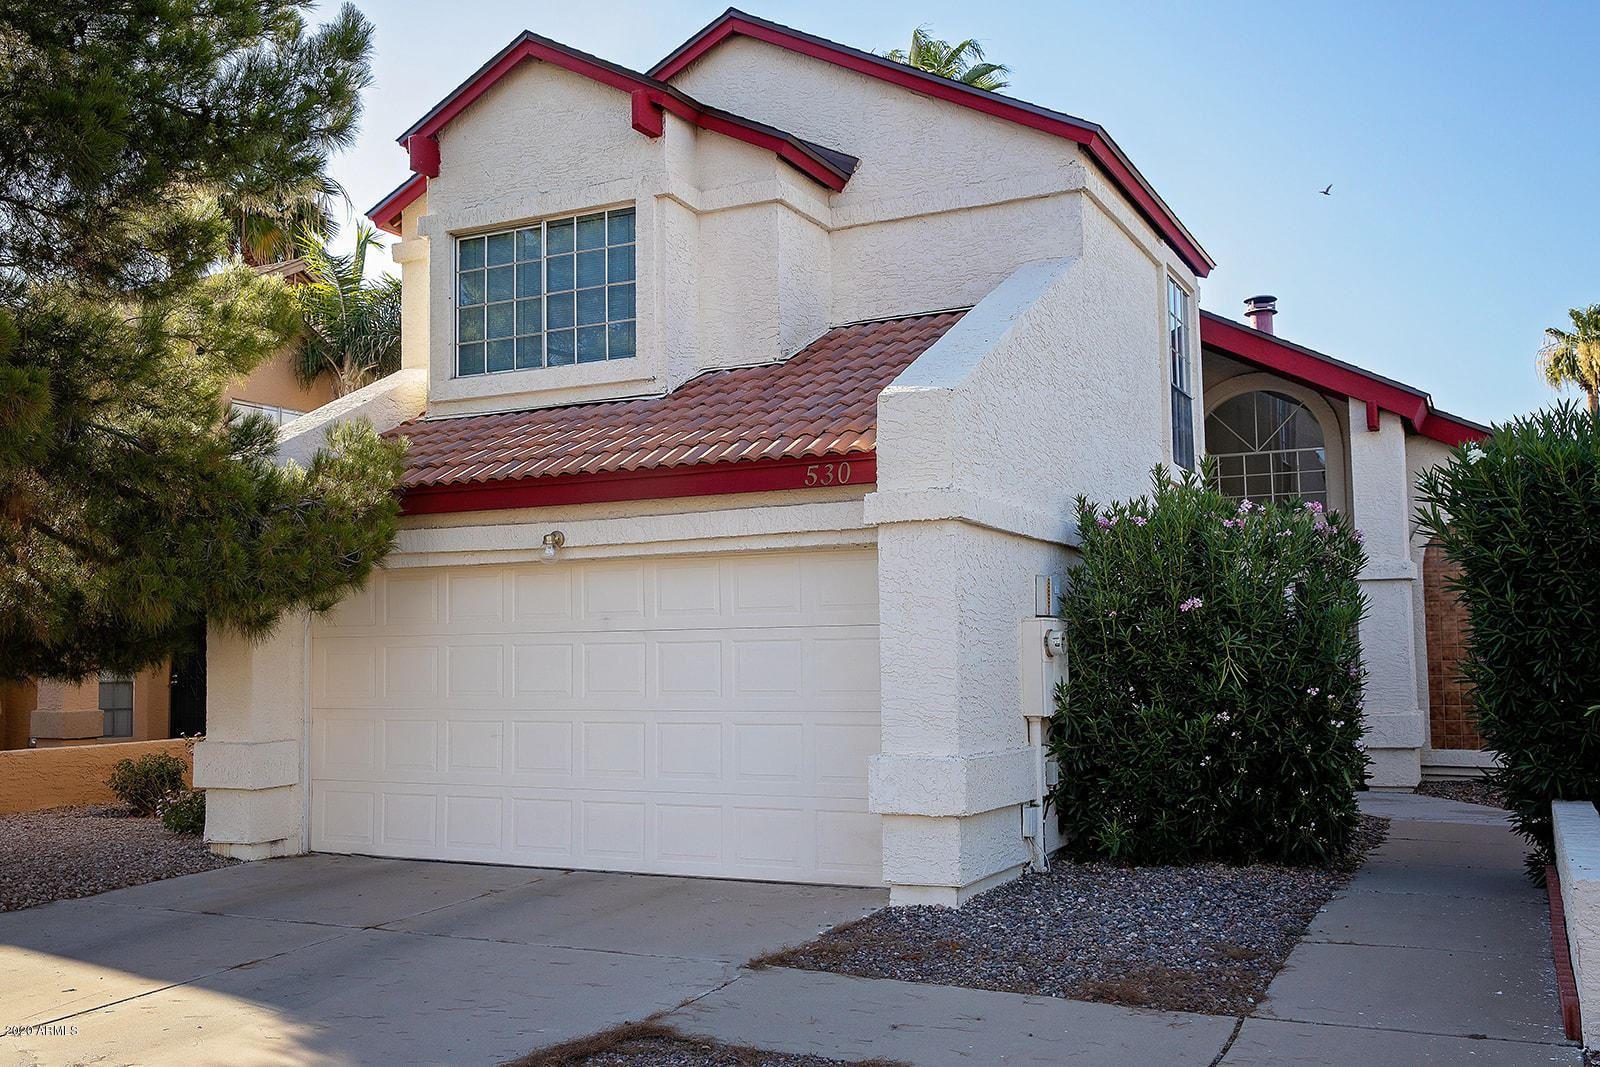 530 E TOPEKA Drive, Phoenix, AZ 85024 - MLS#: 6097558